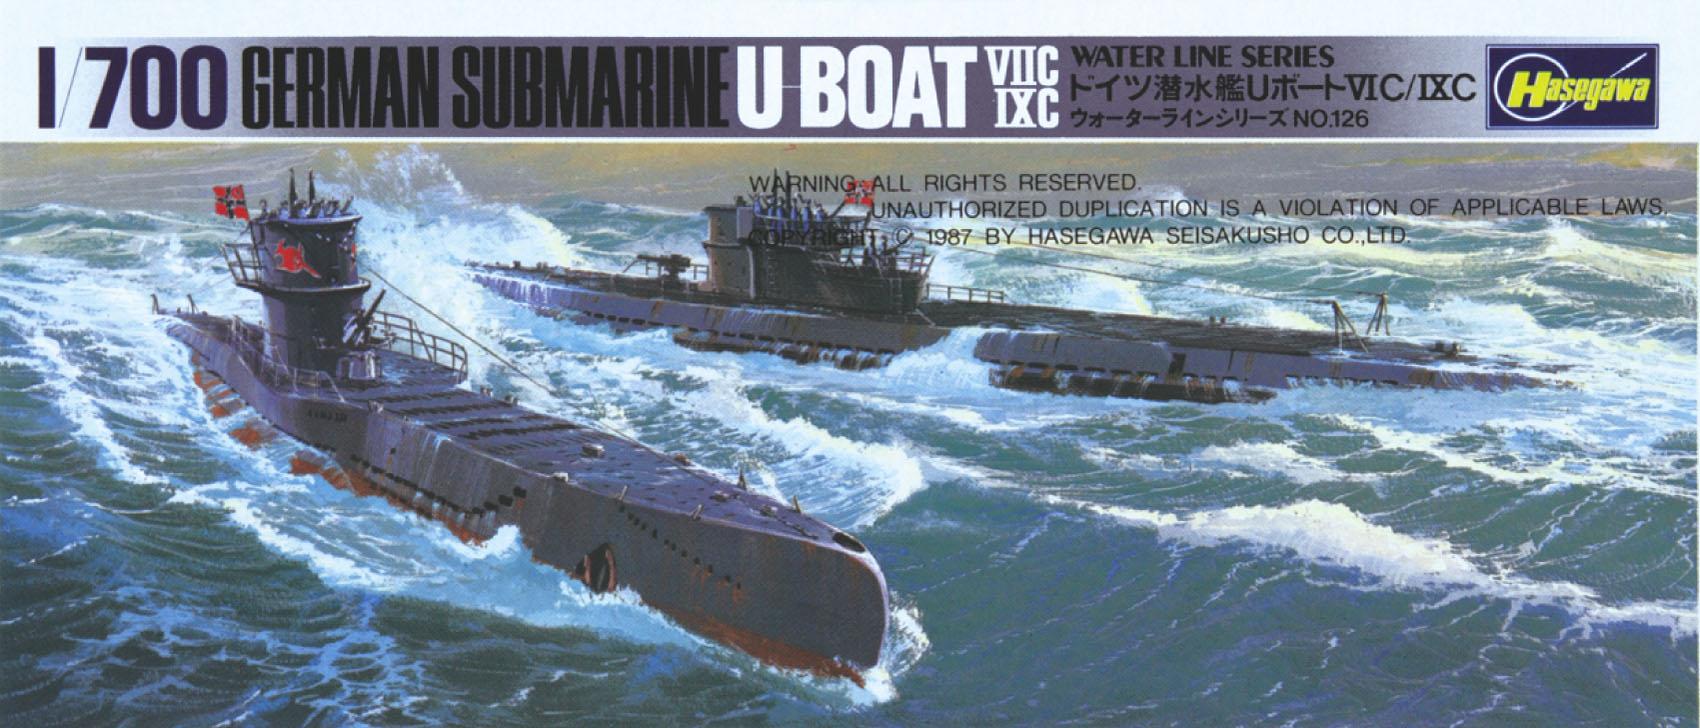 Hasegawa Submarine U Boat 7C/9C